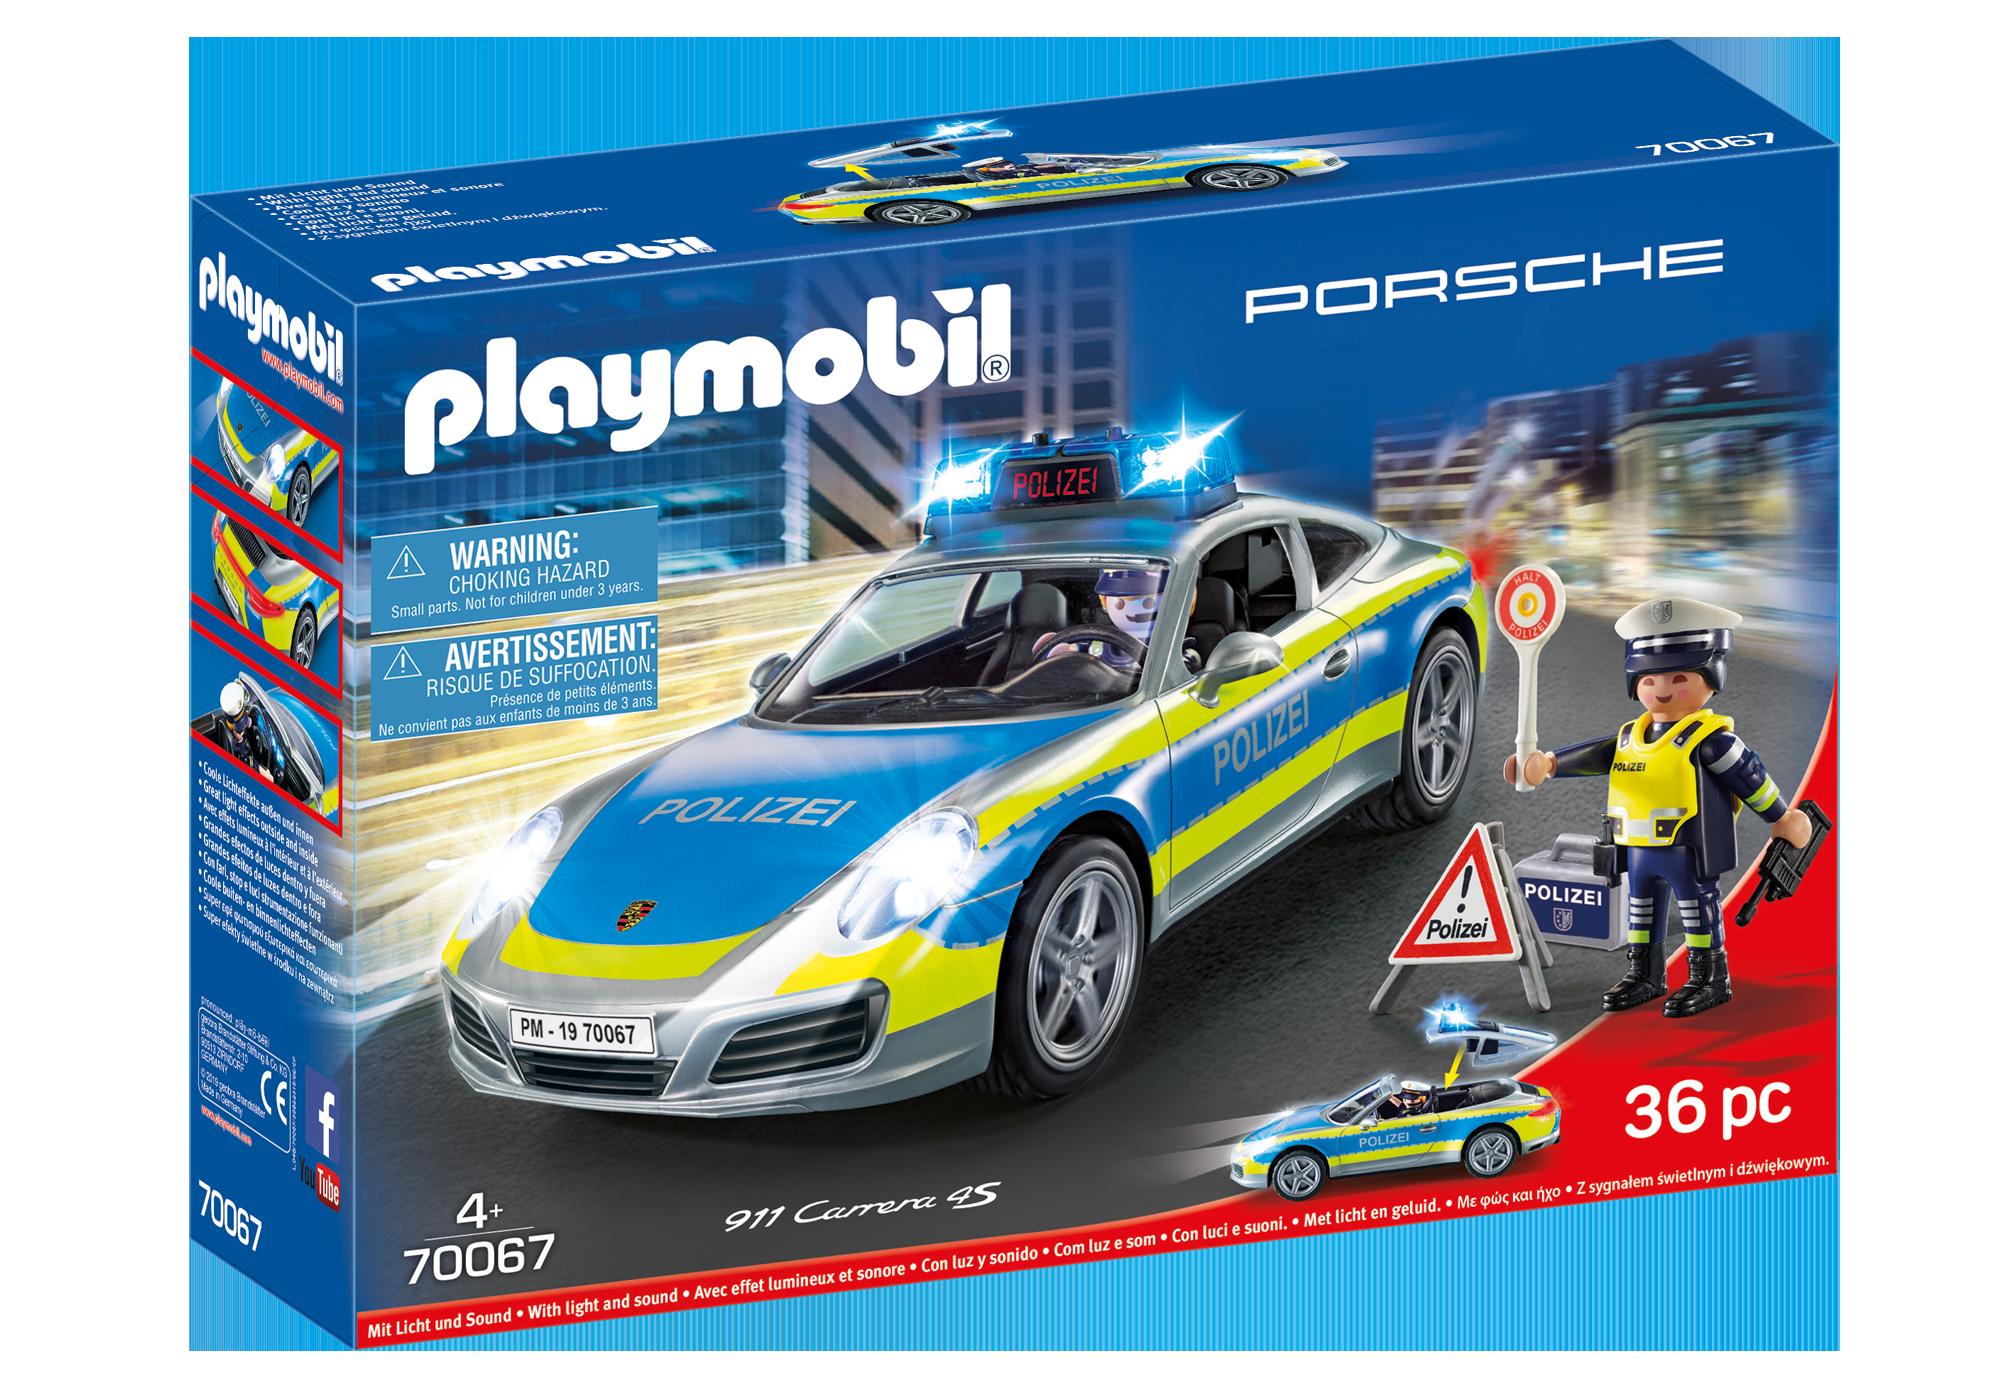 http://media.playmobil.com/i/playmobil/70067_product_box_front